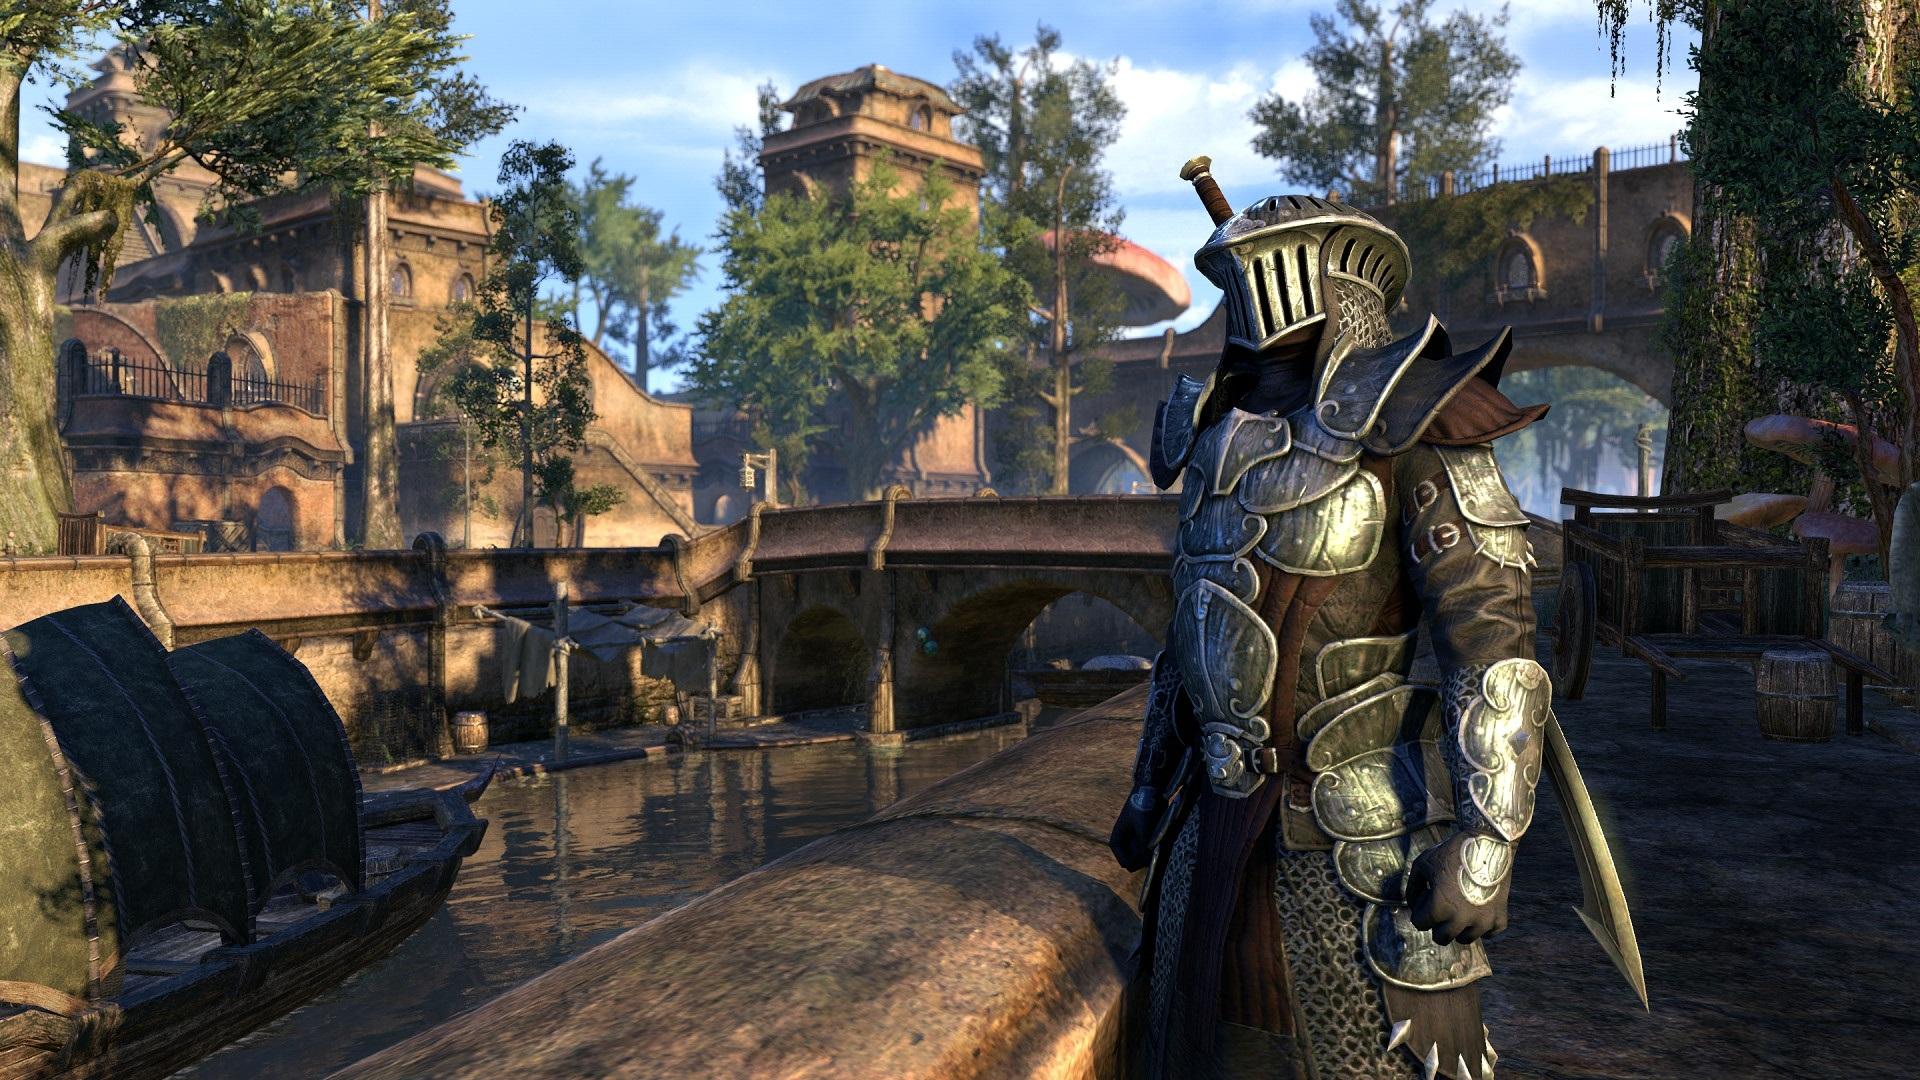 BUY The Elder Scrolls Online - Morrowind Digital Coll. ed. Upgrade Elder Scrolls Online CD KEY